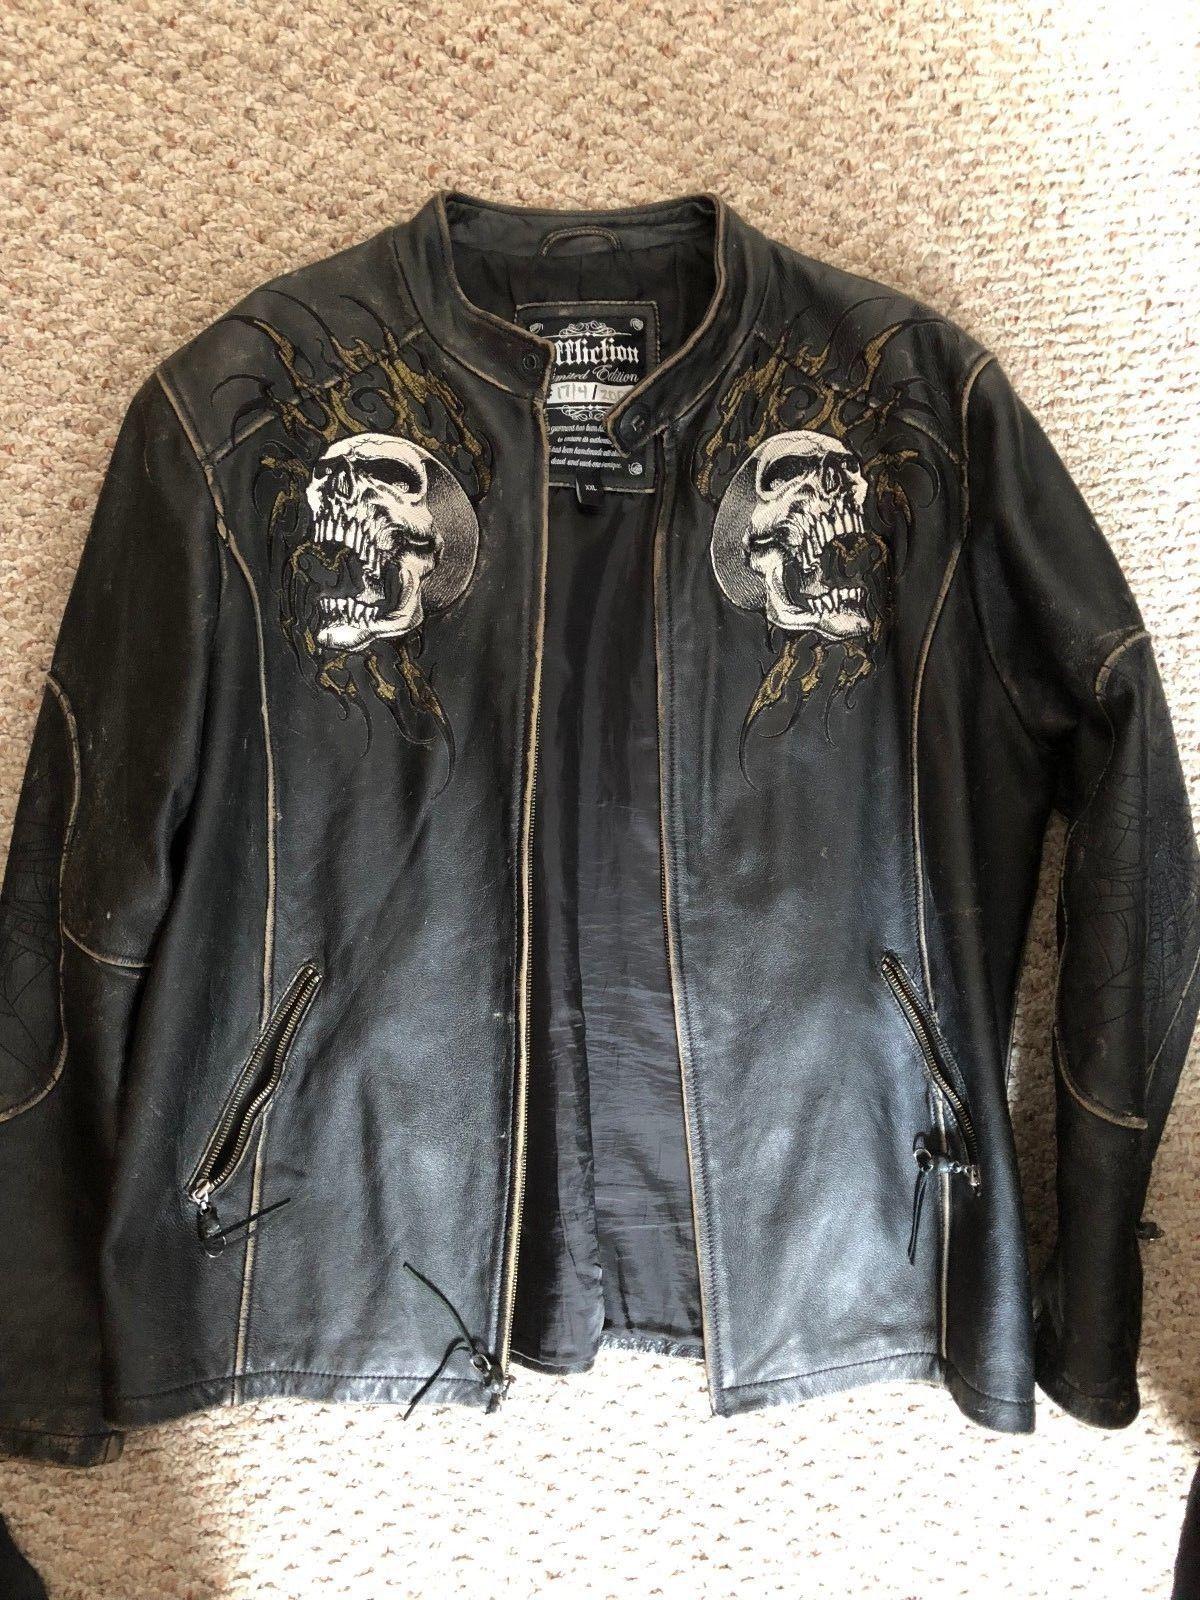 Original Distressed Affliction Leather Jacket Limited